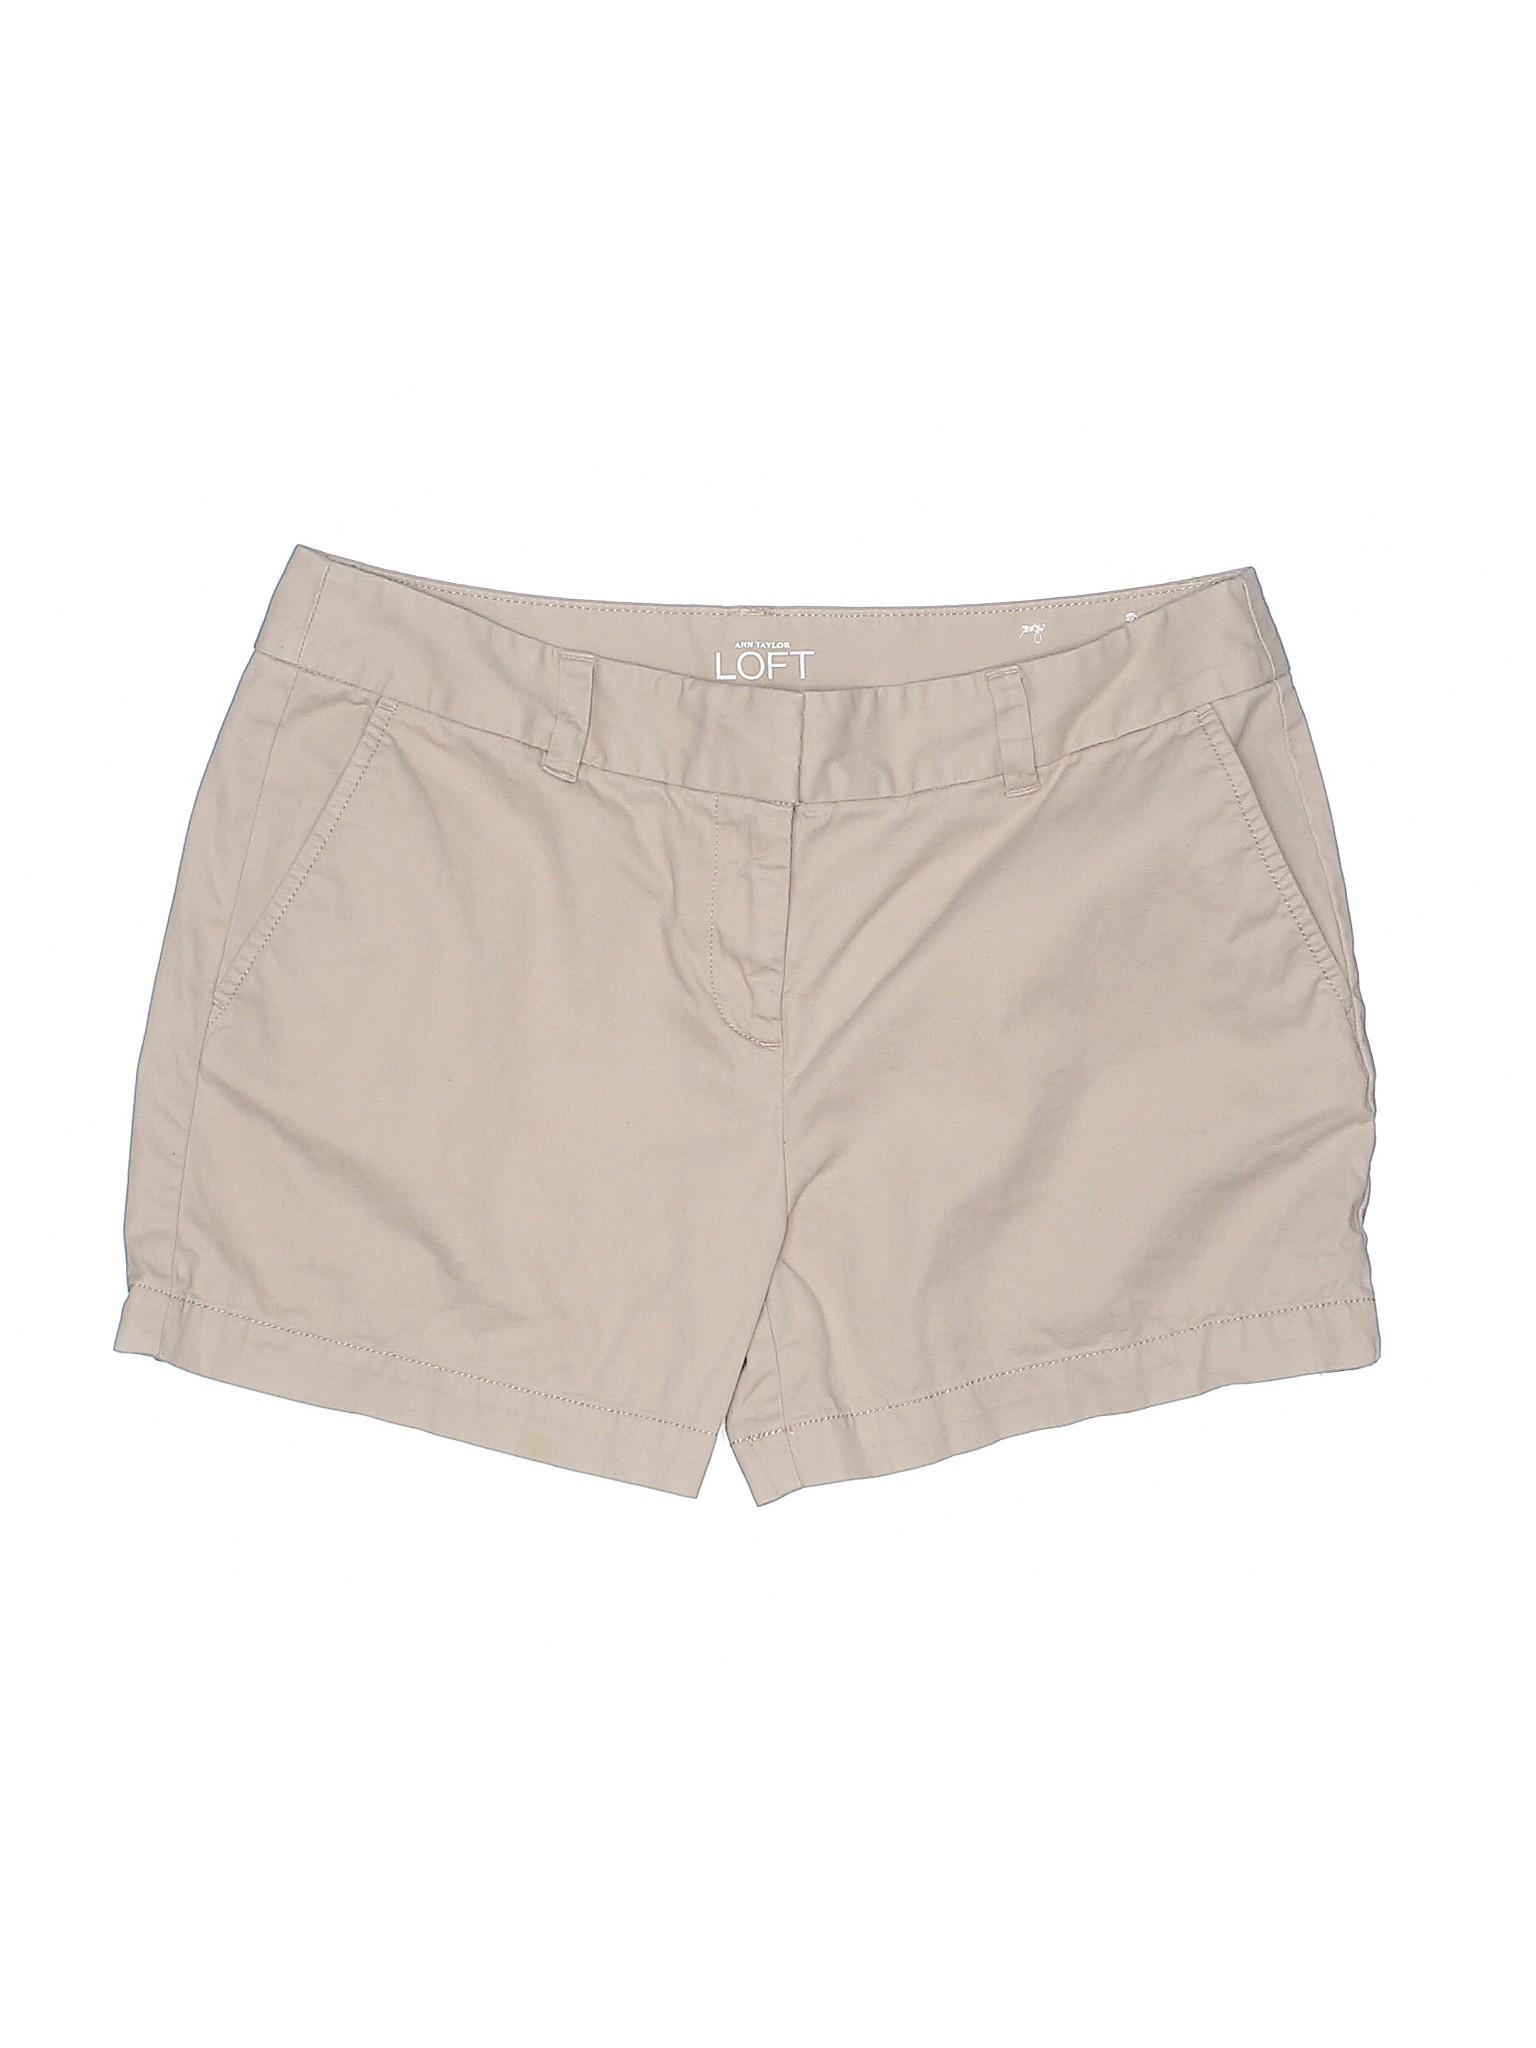 Ann winter Boutique LOFT Taylor Khaki Shorts 78UwP